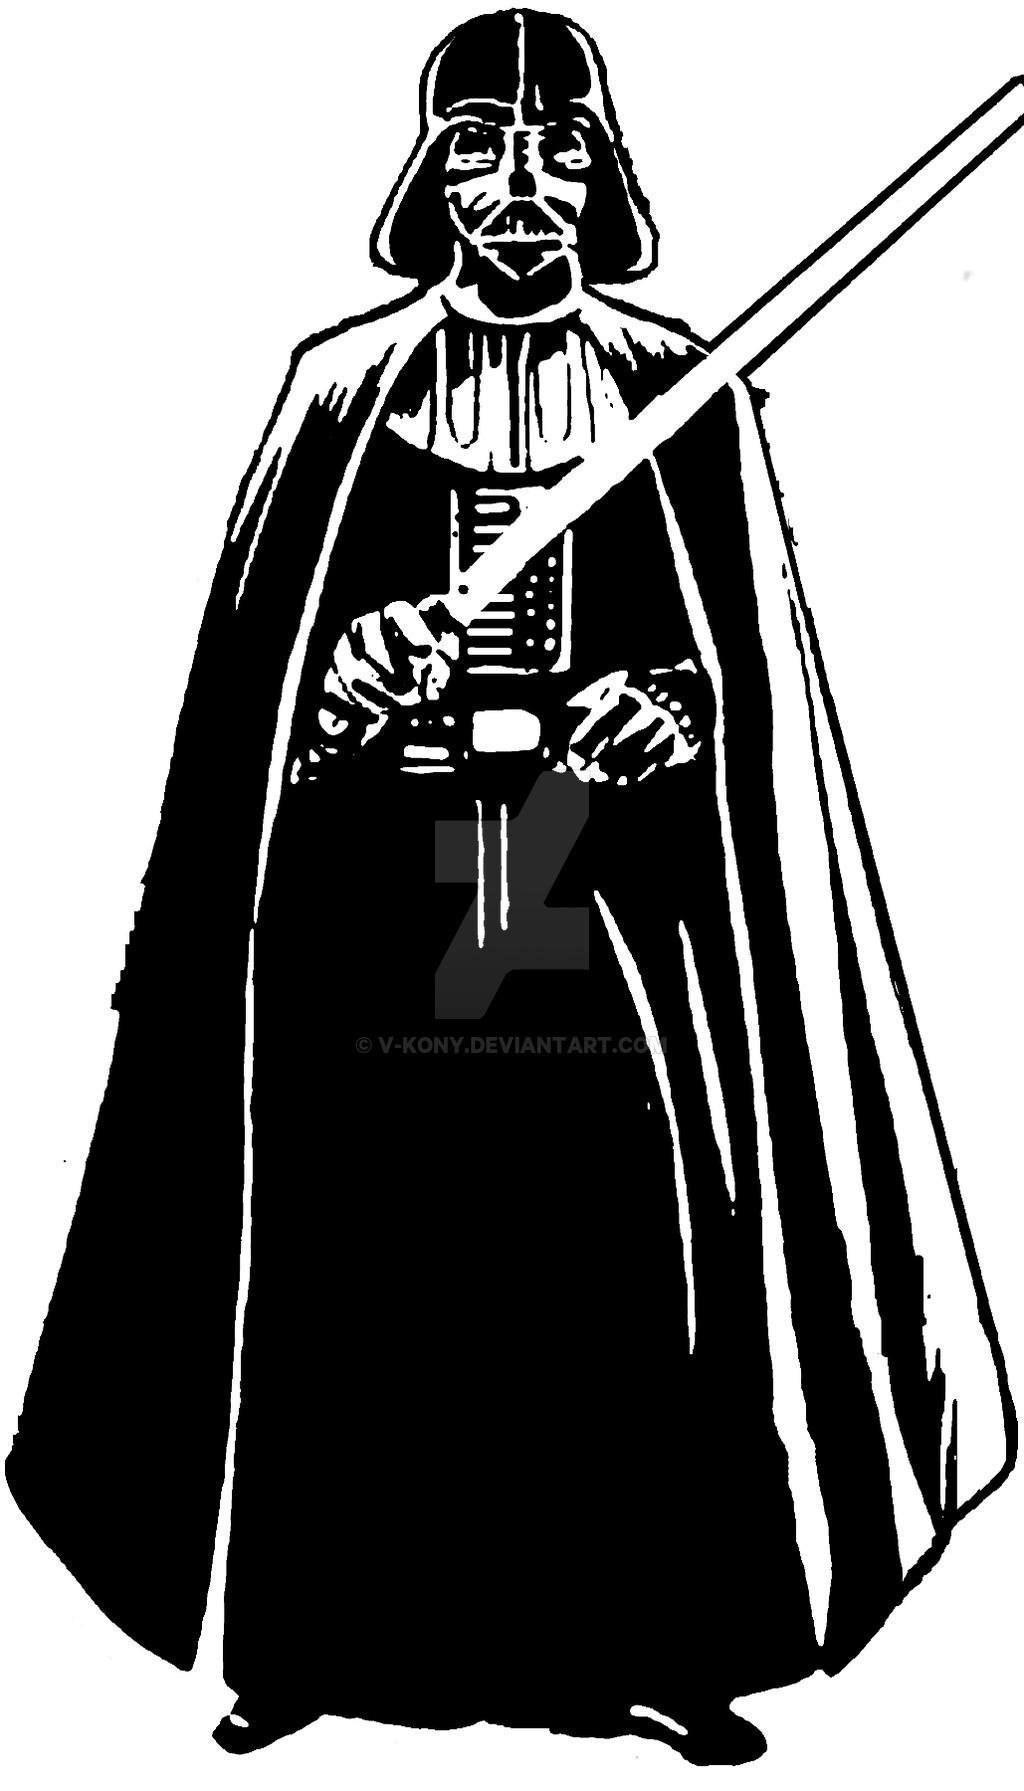 Darth Vader clipart #4, Download drawings